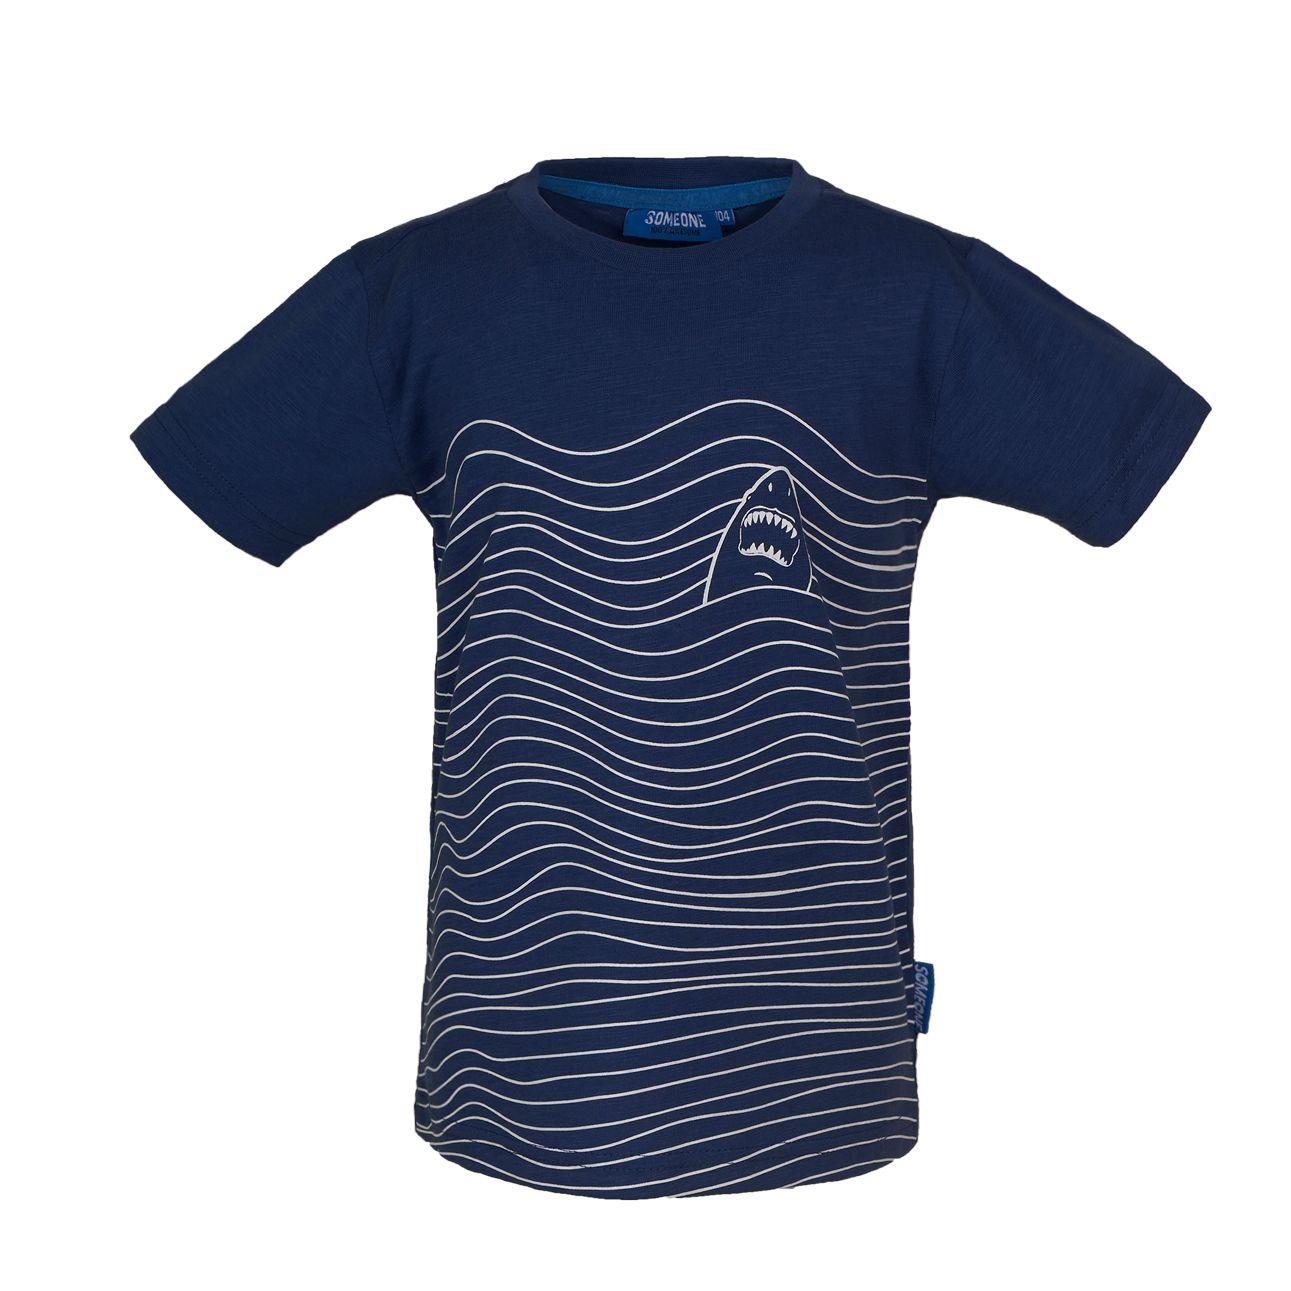 T-Shirt Hai 116 Blue SOMEONE 100% Awesome